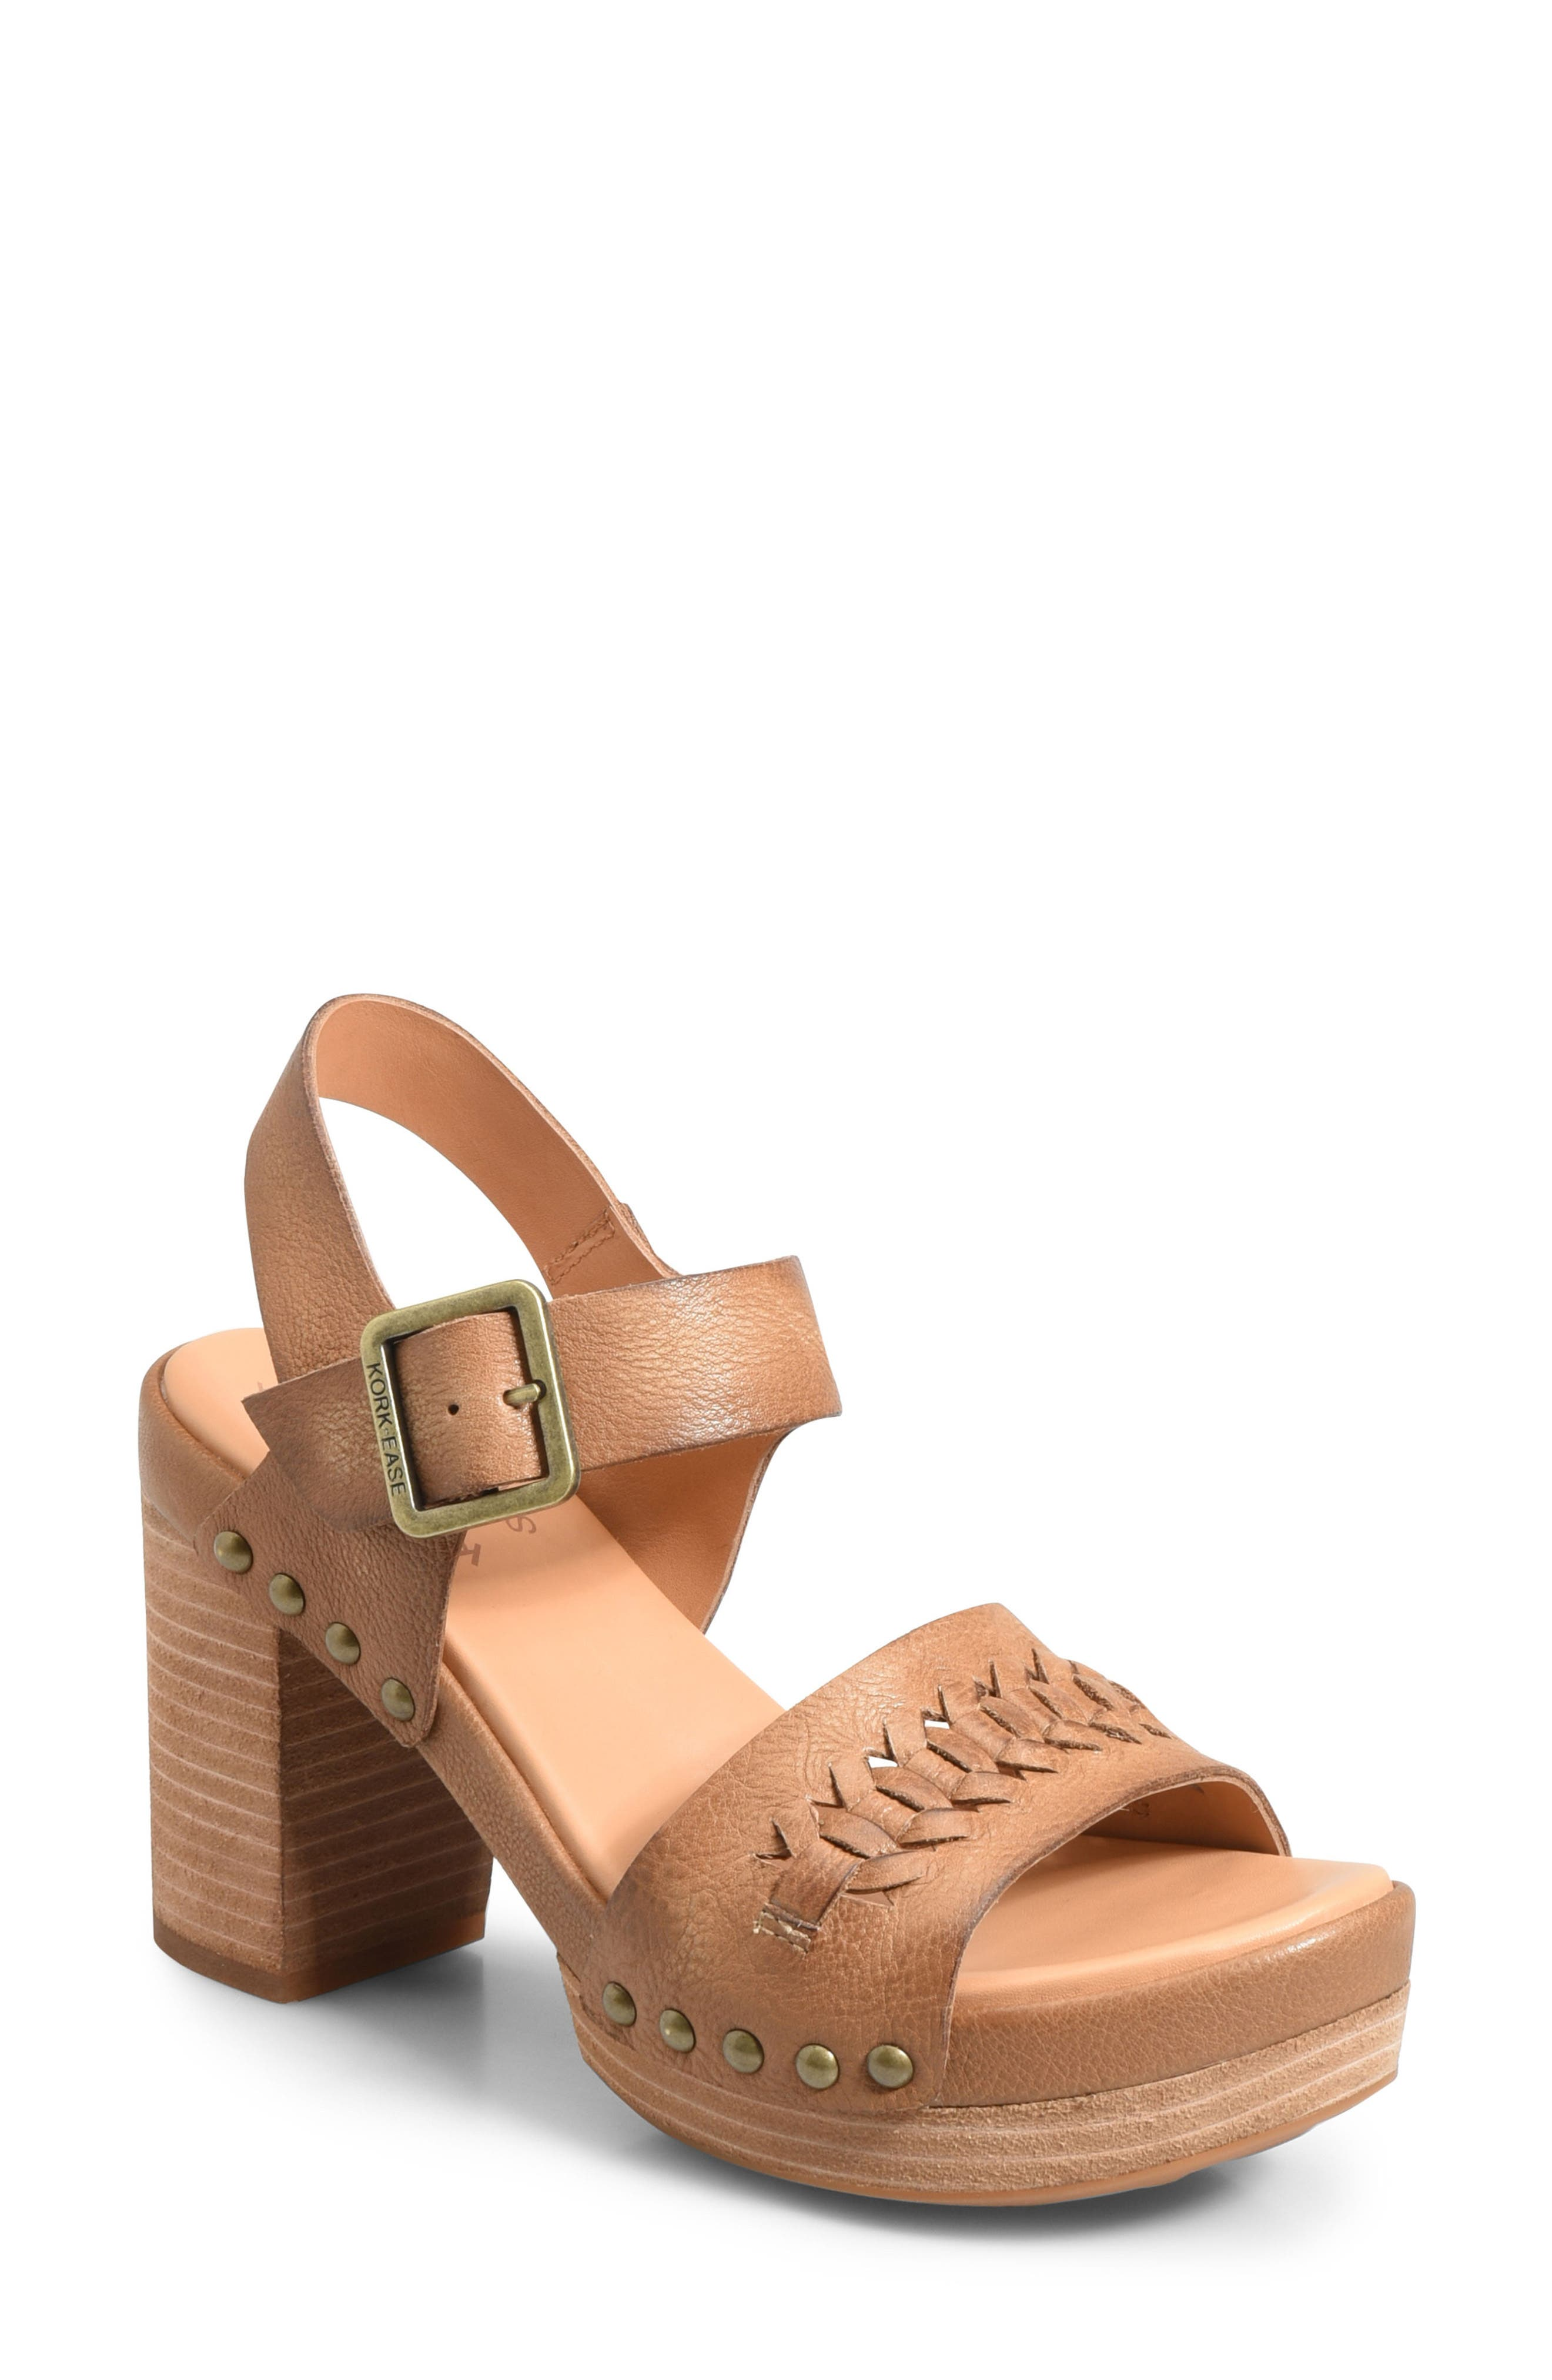 Pasilla Platform Sandal,                         Main,                         color, Light Brown Leather